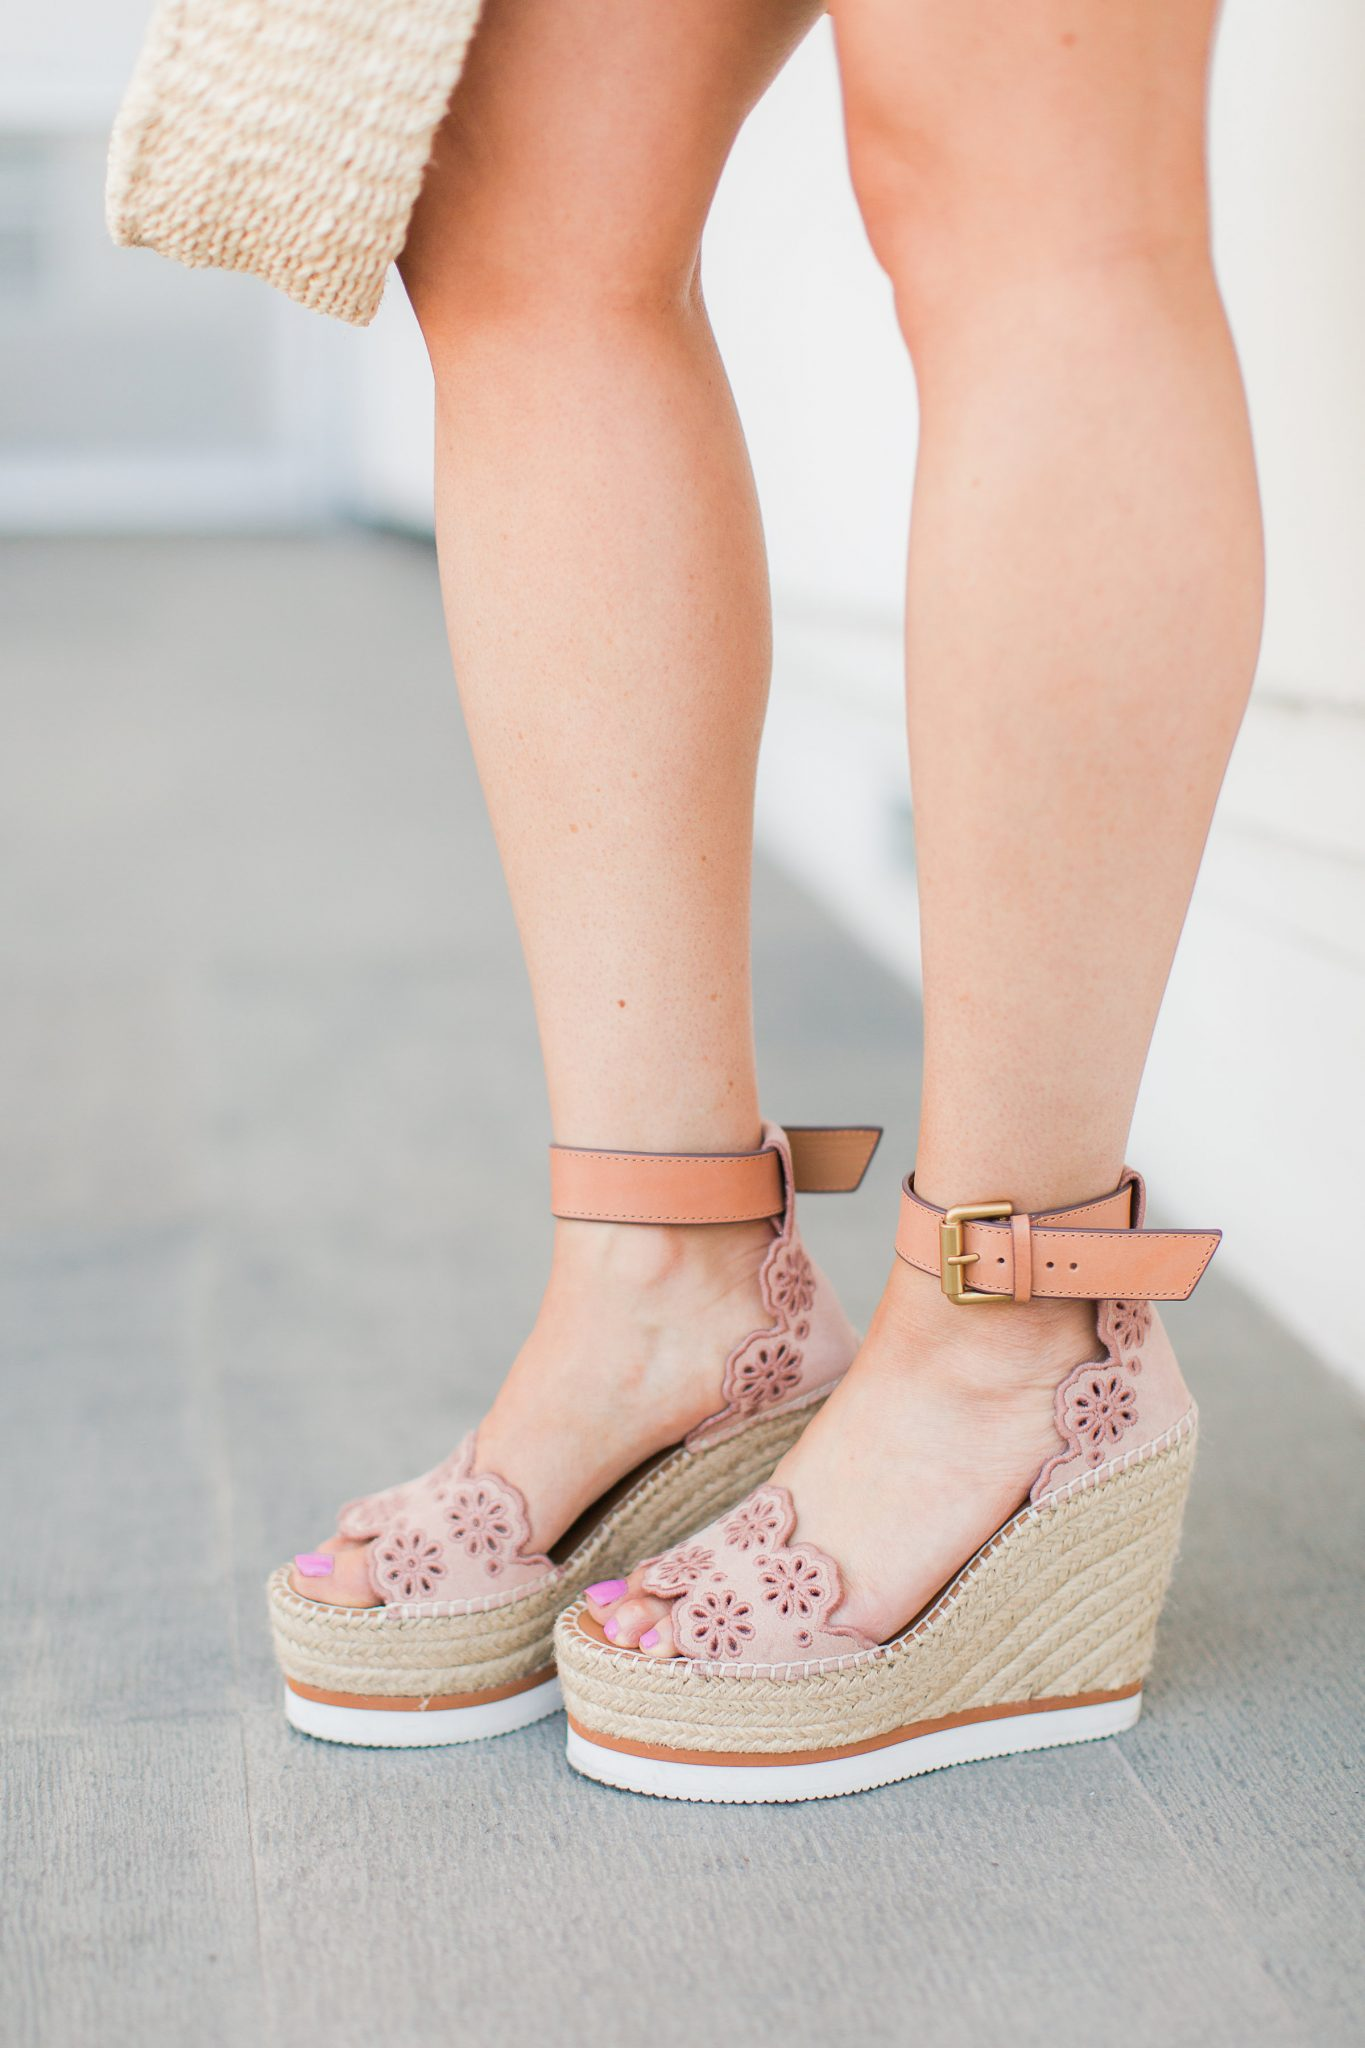 See by Chloe espadrille wedges by popular Orange County fashion blogger Maxie Elise